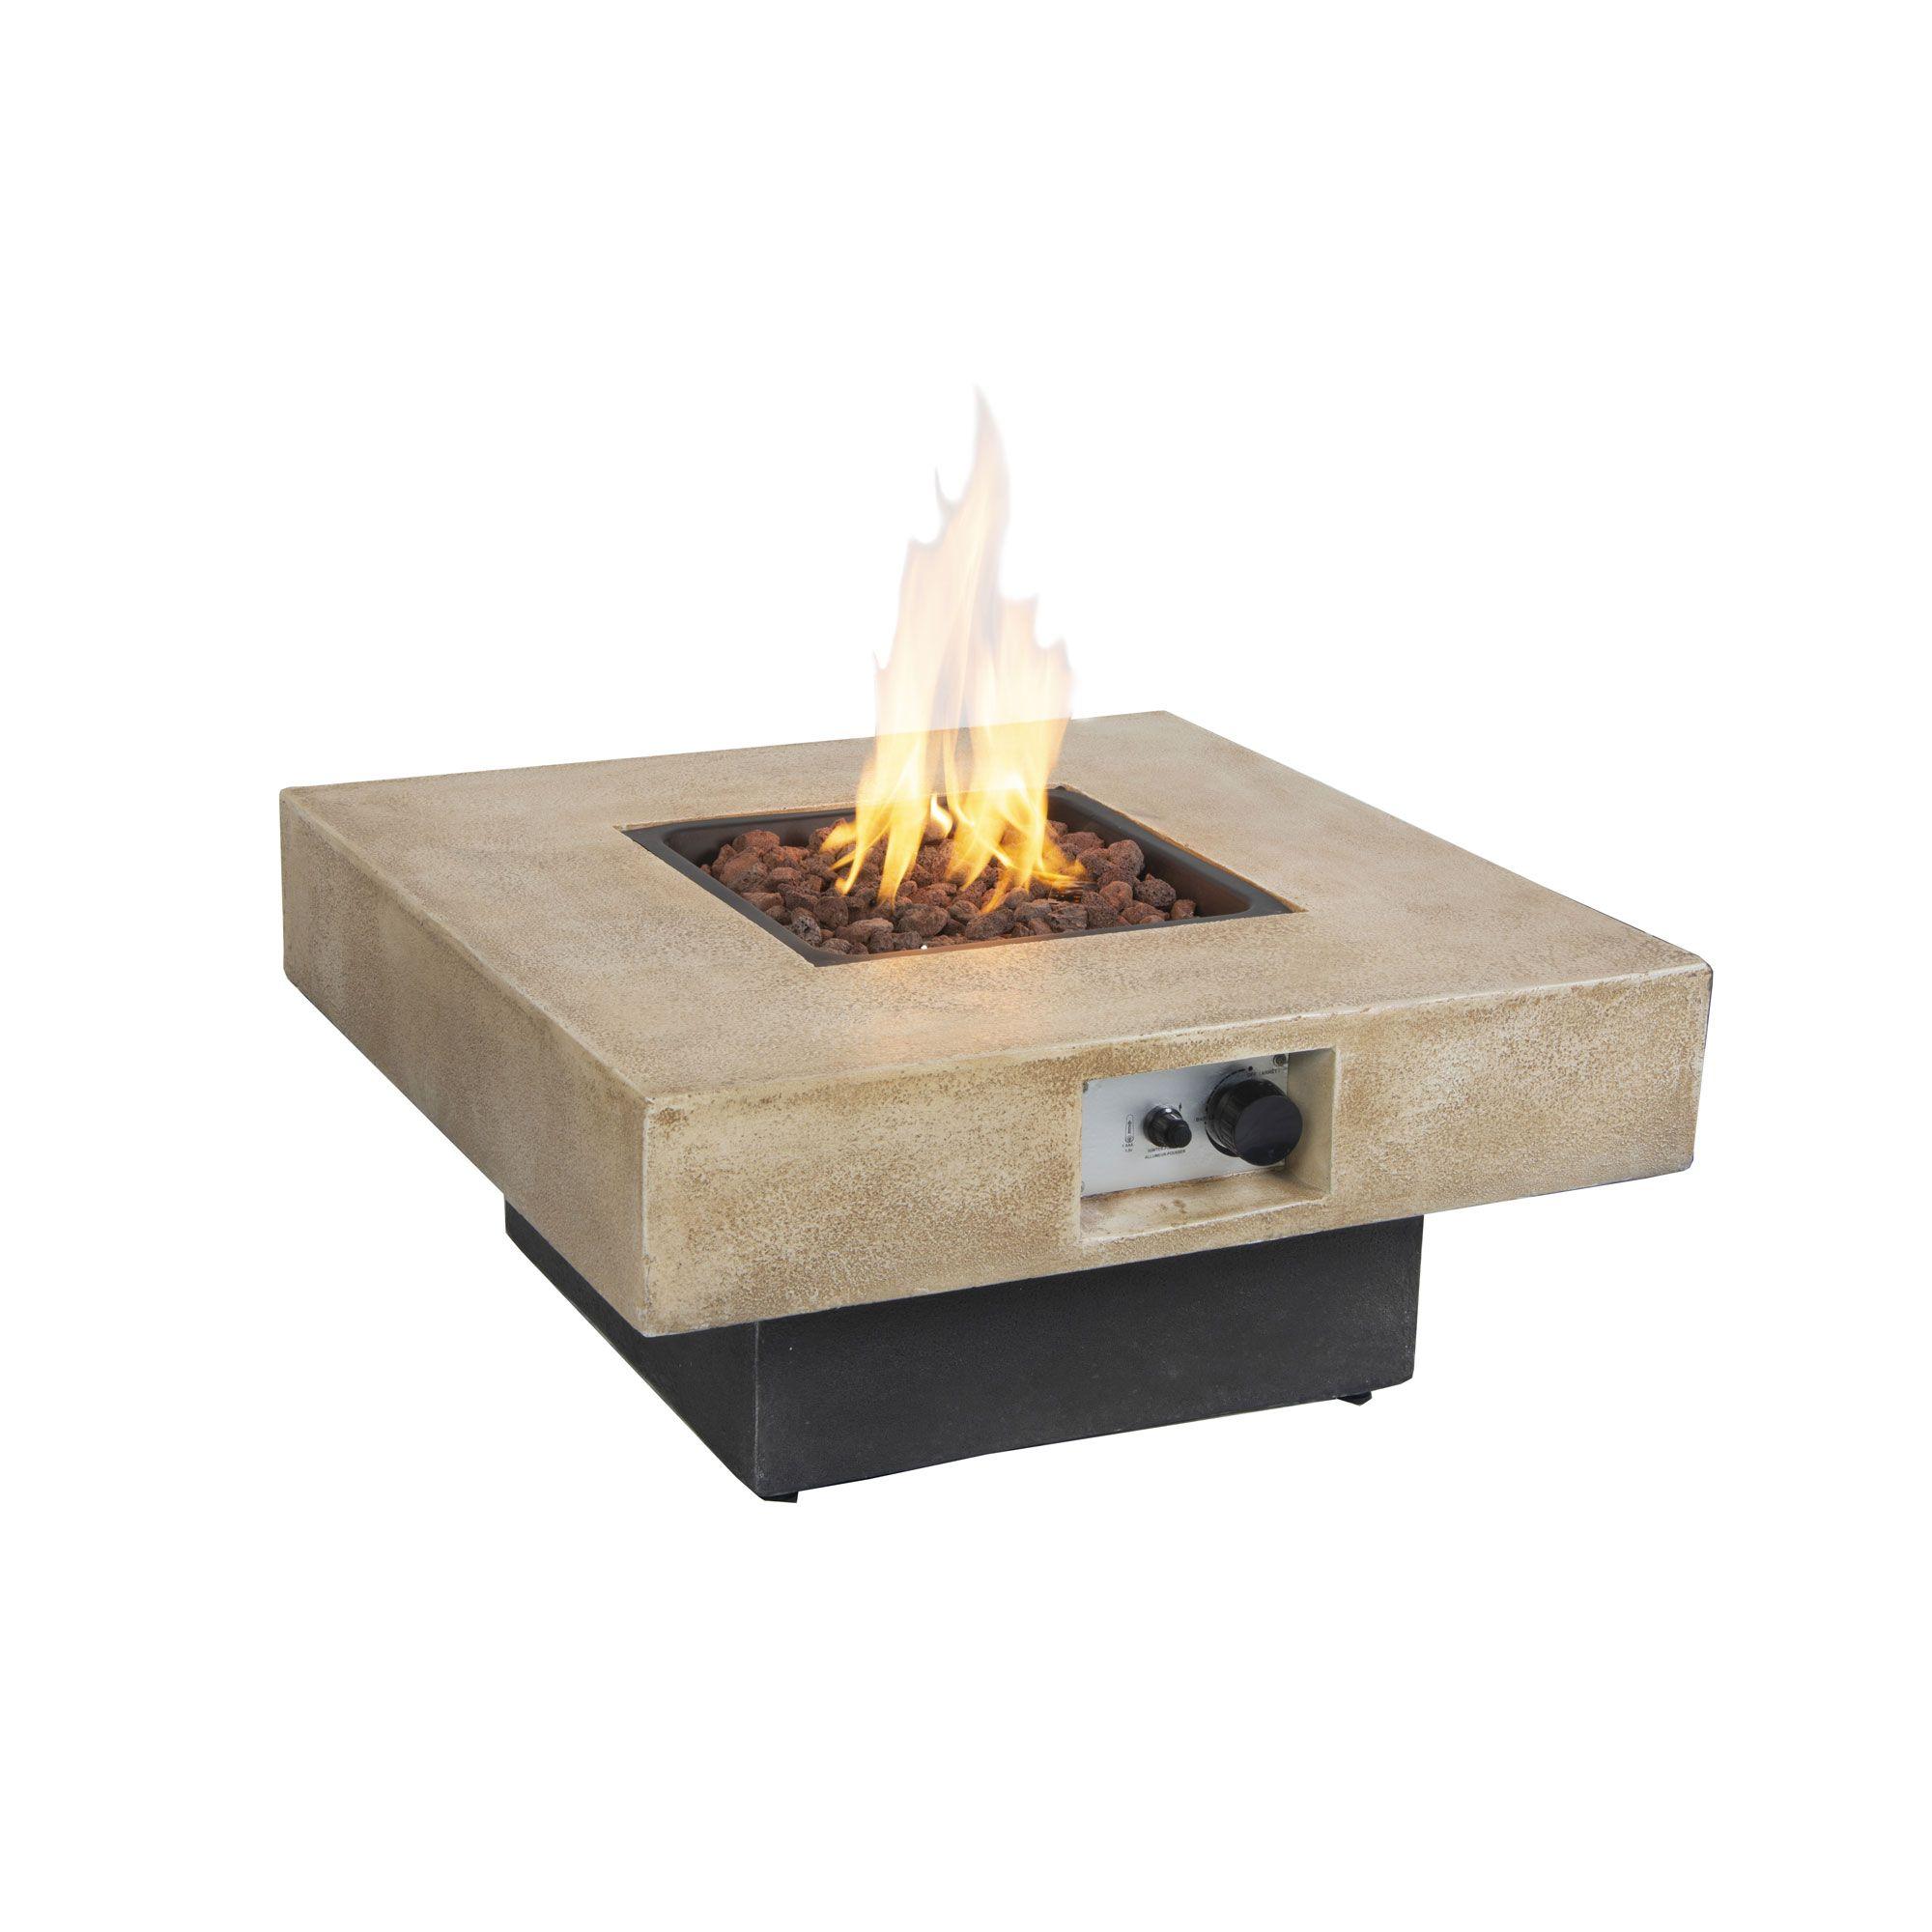 Brayden Gas Fire Table Outdoor Heating Kent Building Supplies